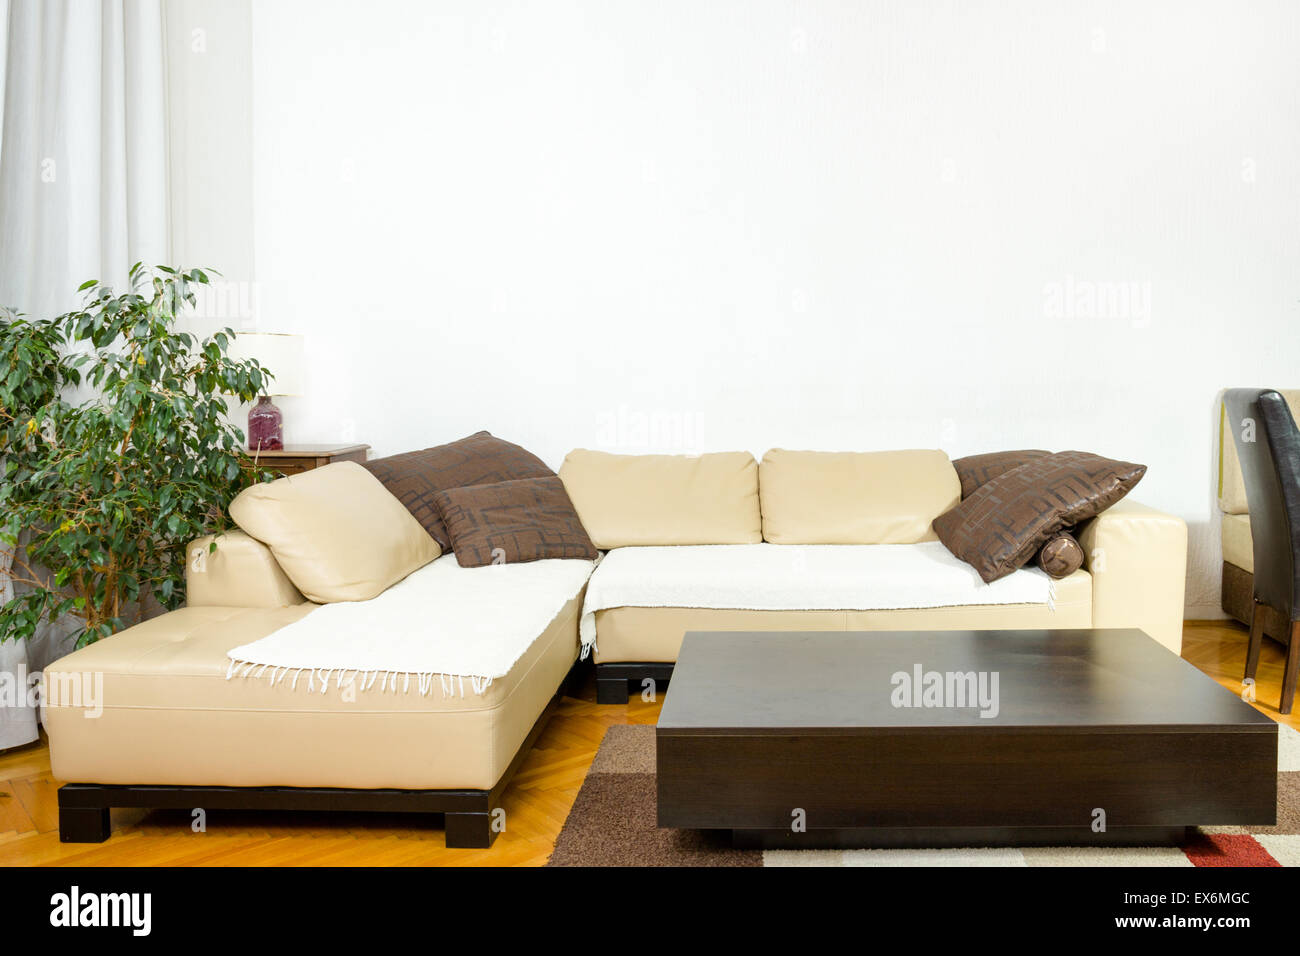 Dinner Sofa empty living room with angular sofa dinner wagon plant curtains